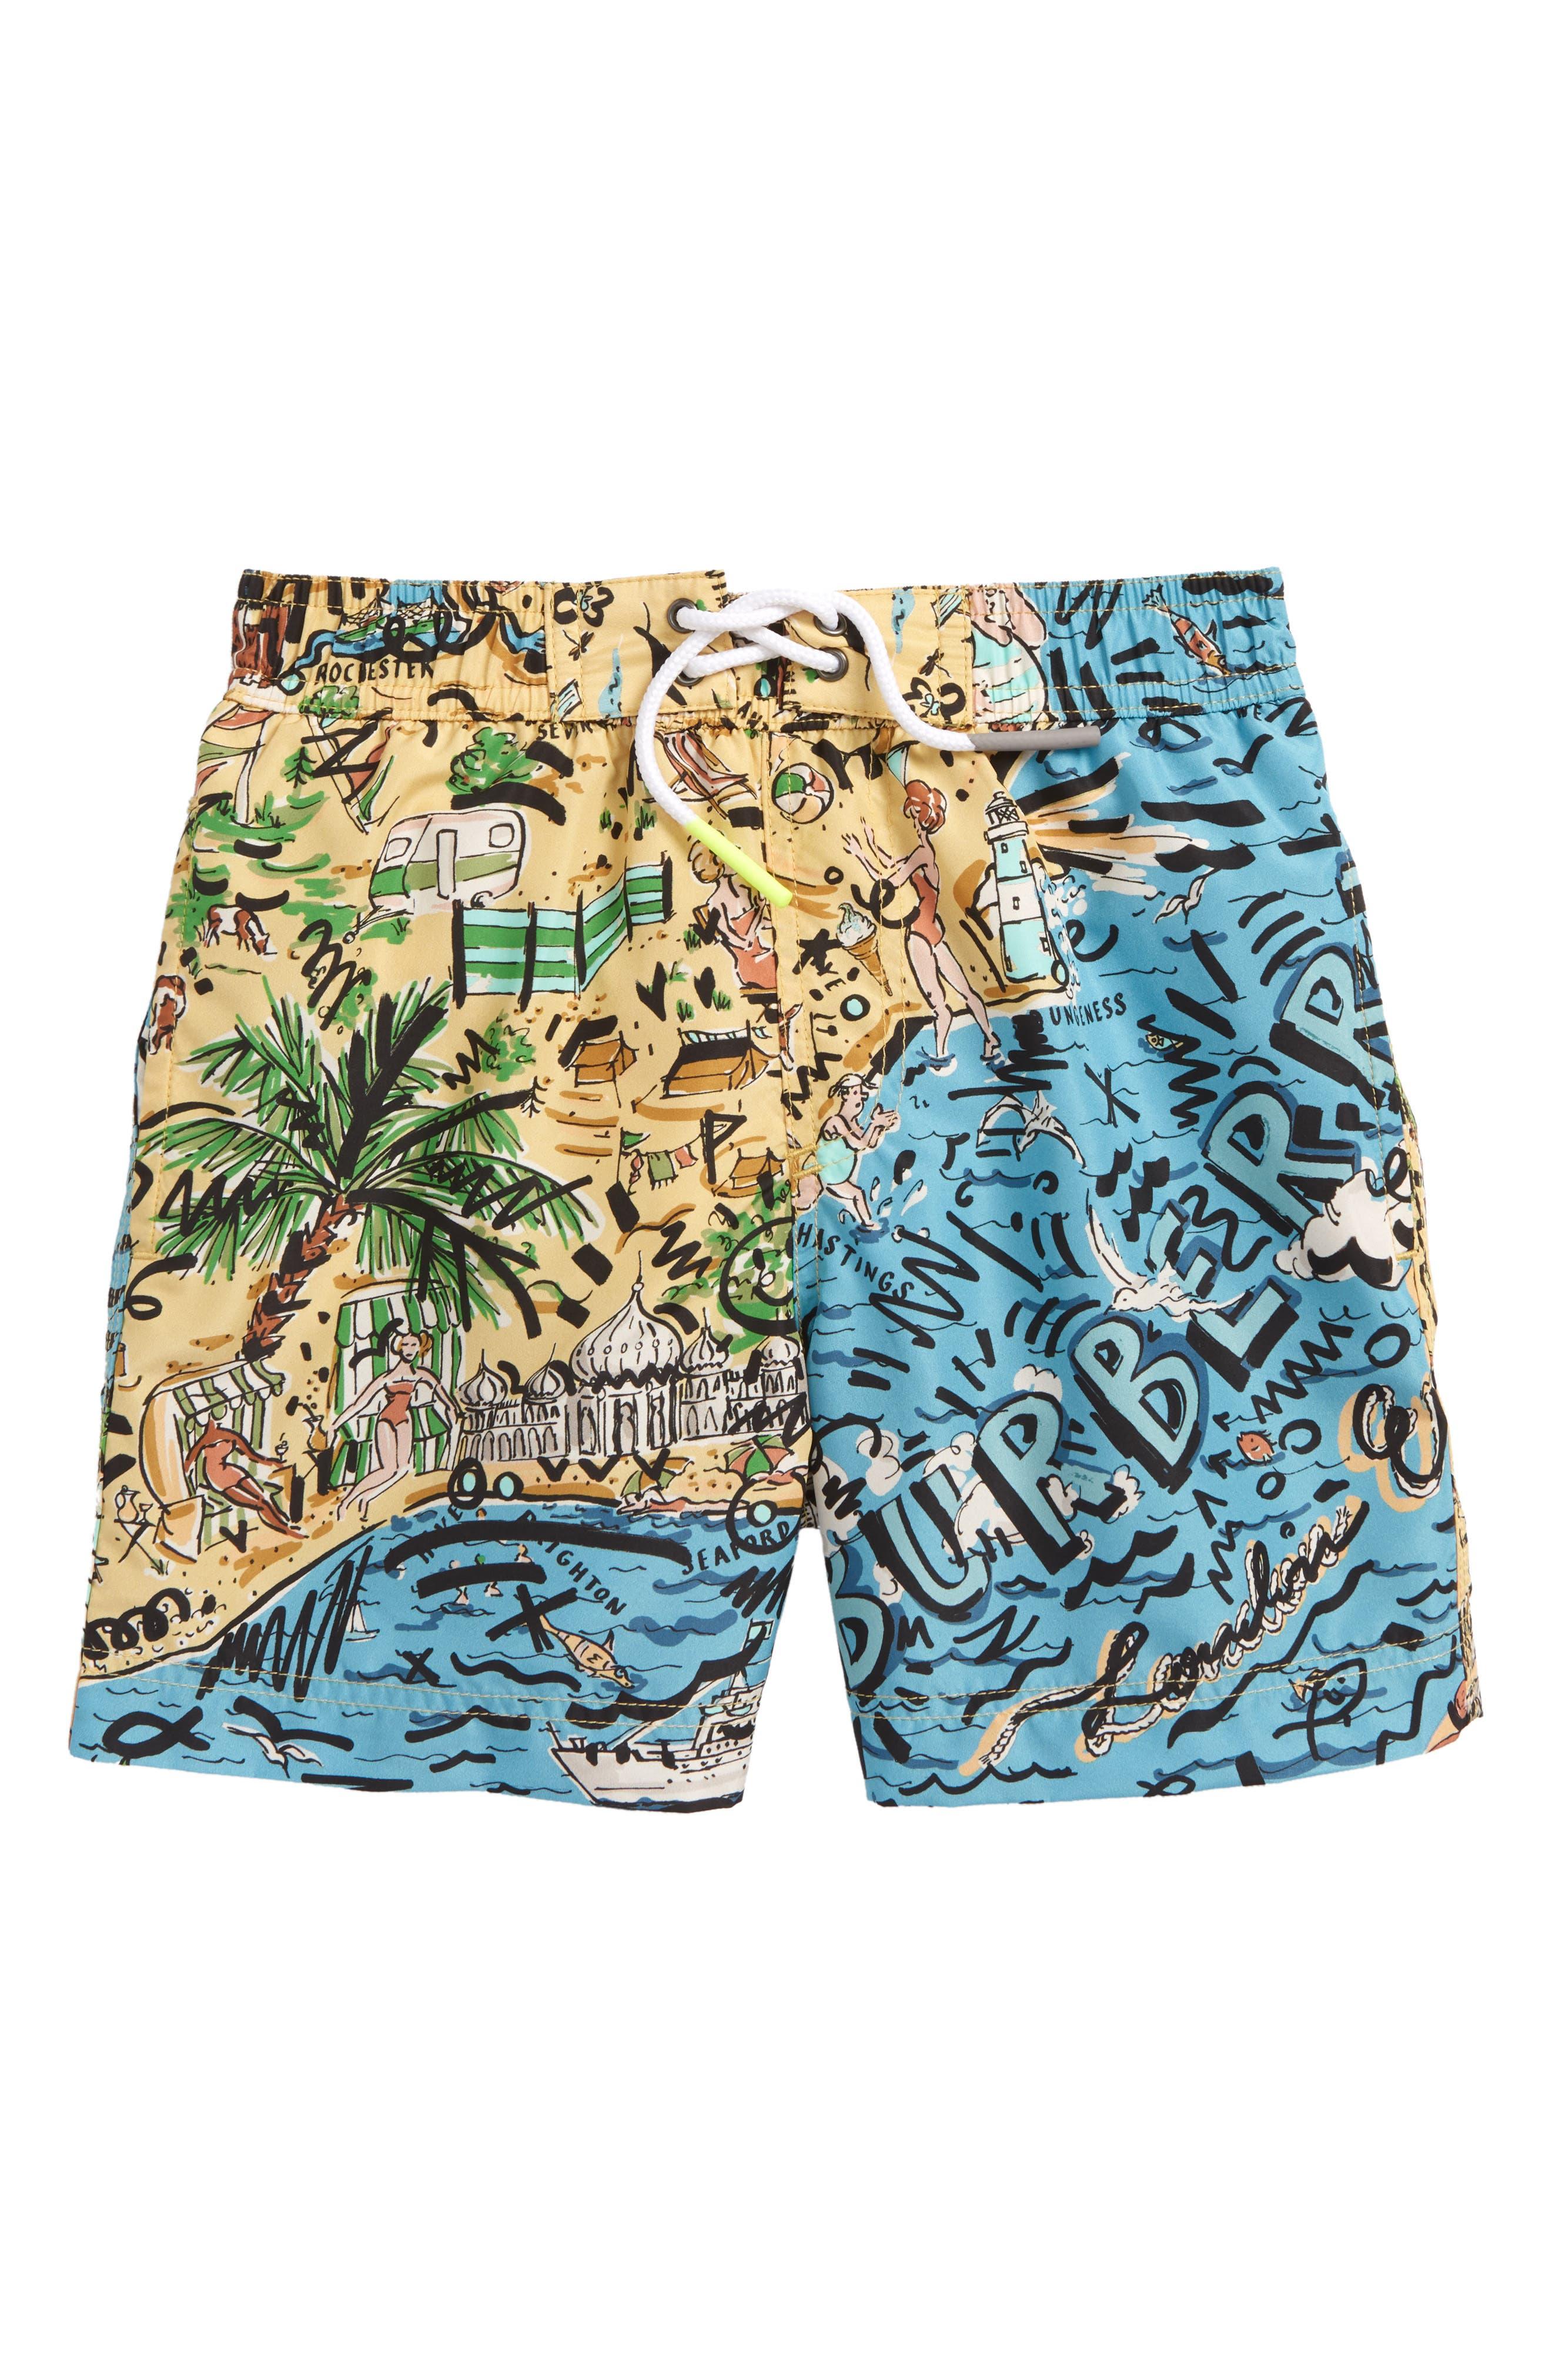 Ben Swim Trunks,                         Main,                         color, Sand